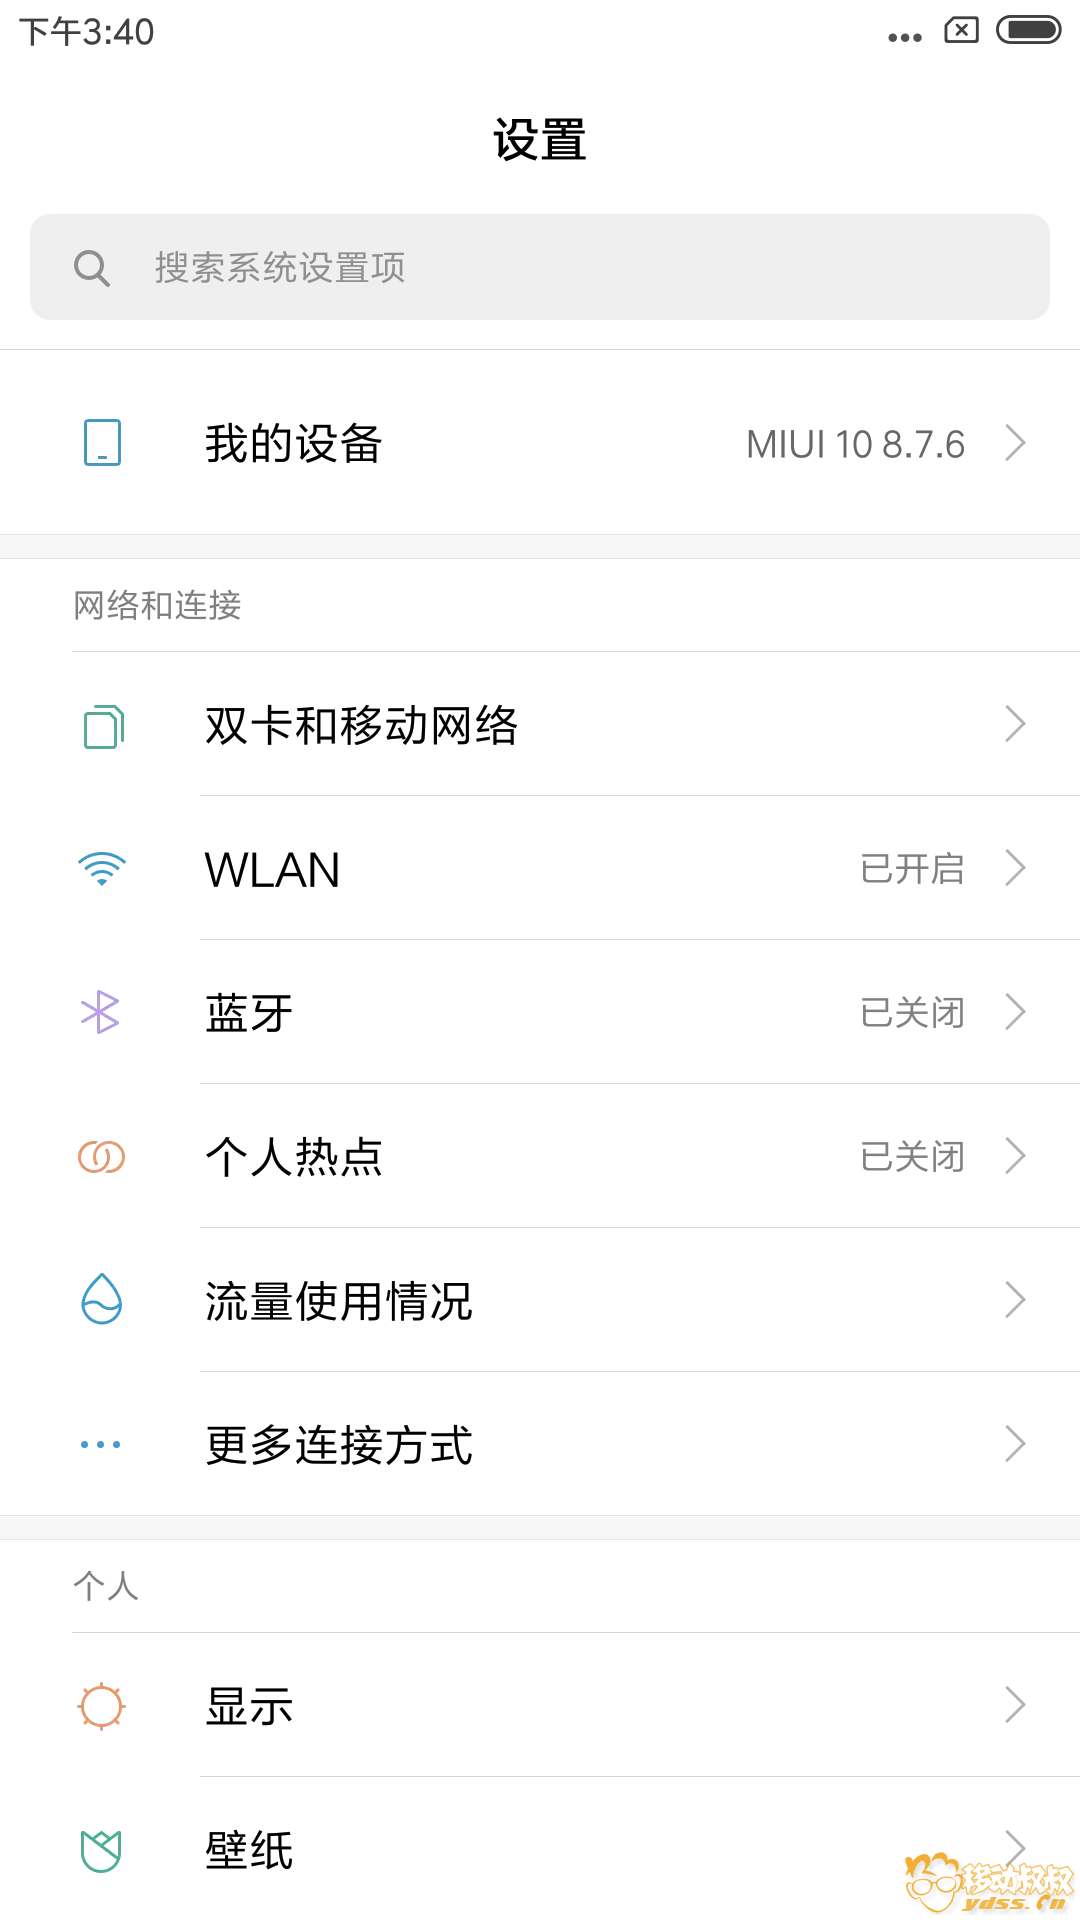 Screenshot_2018-07-06-15-40-32-936_com.android.settings.png